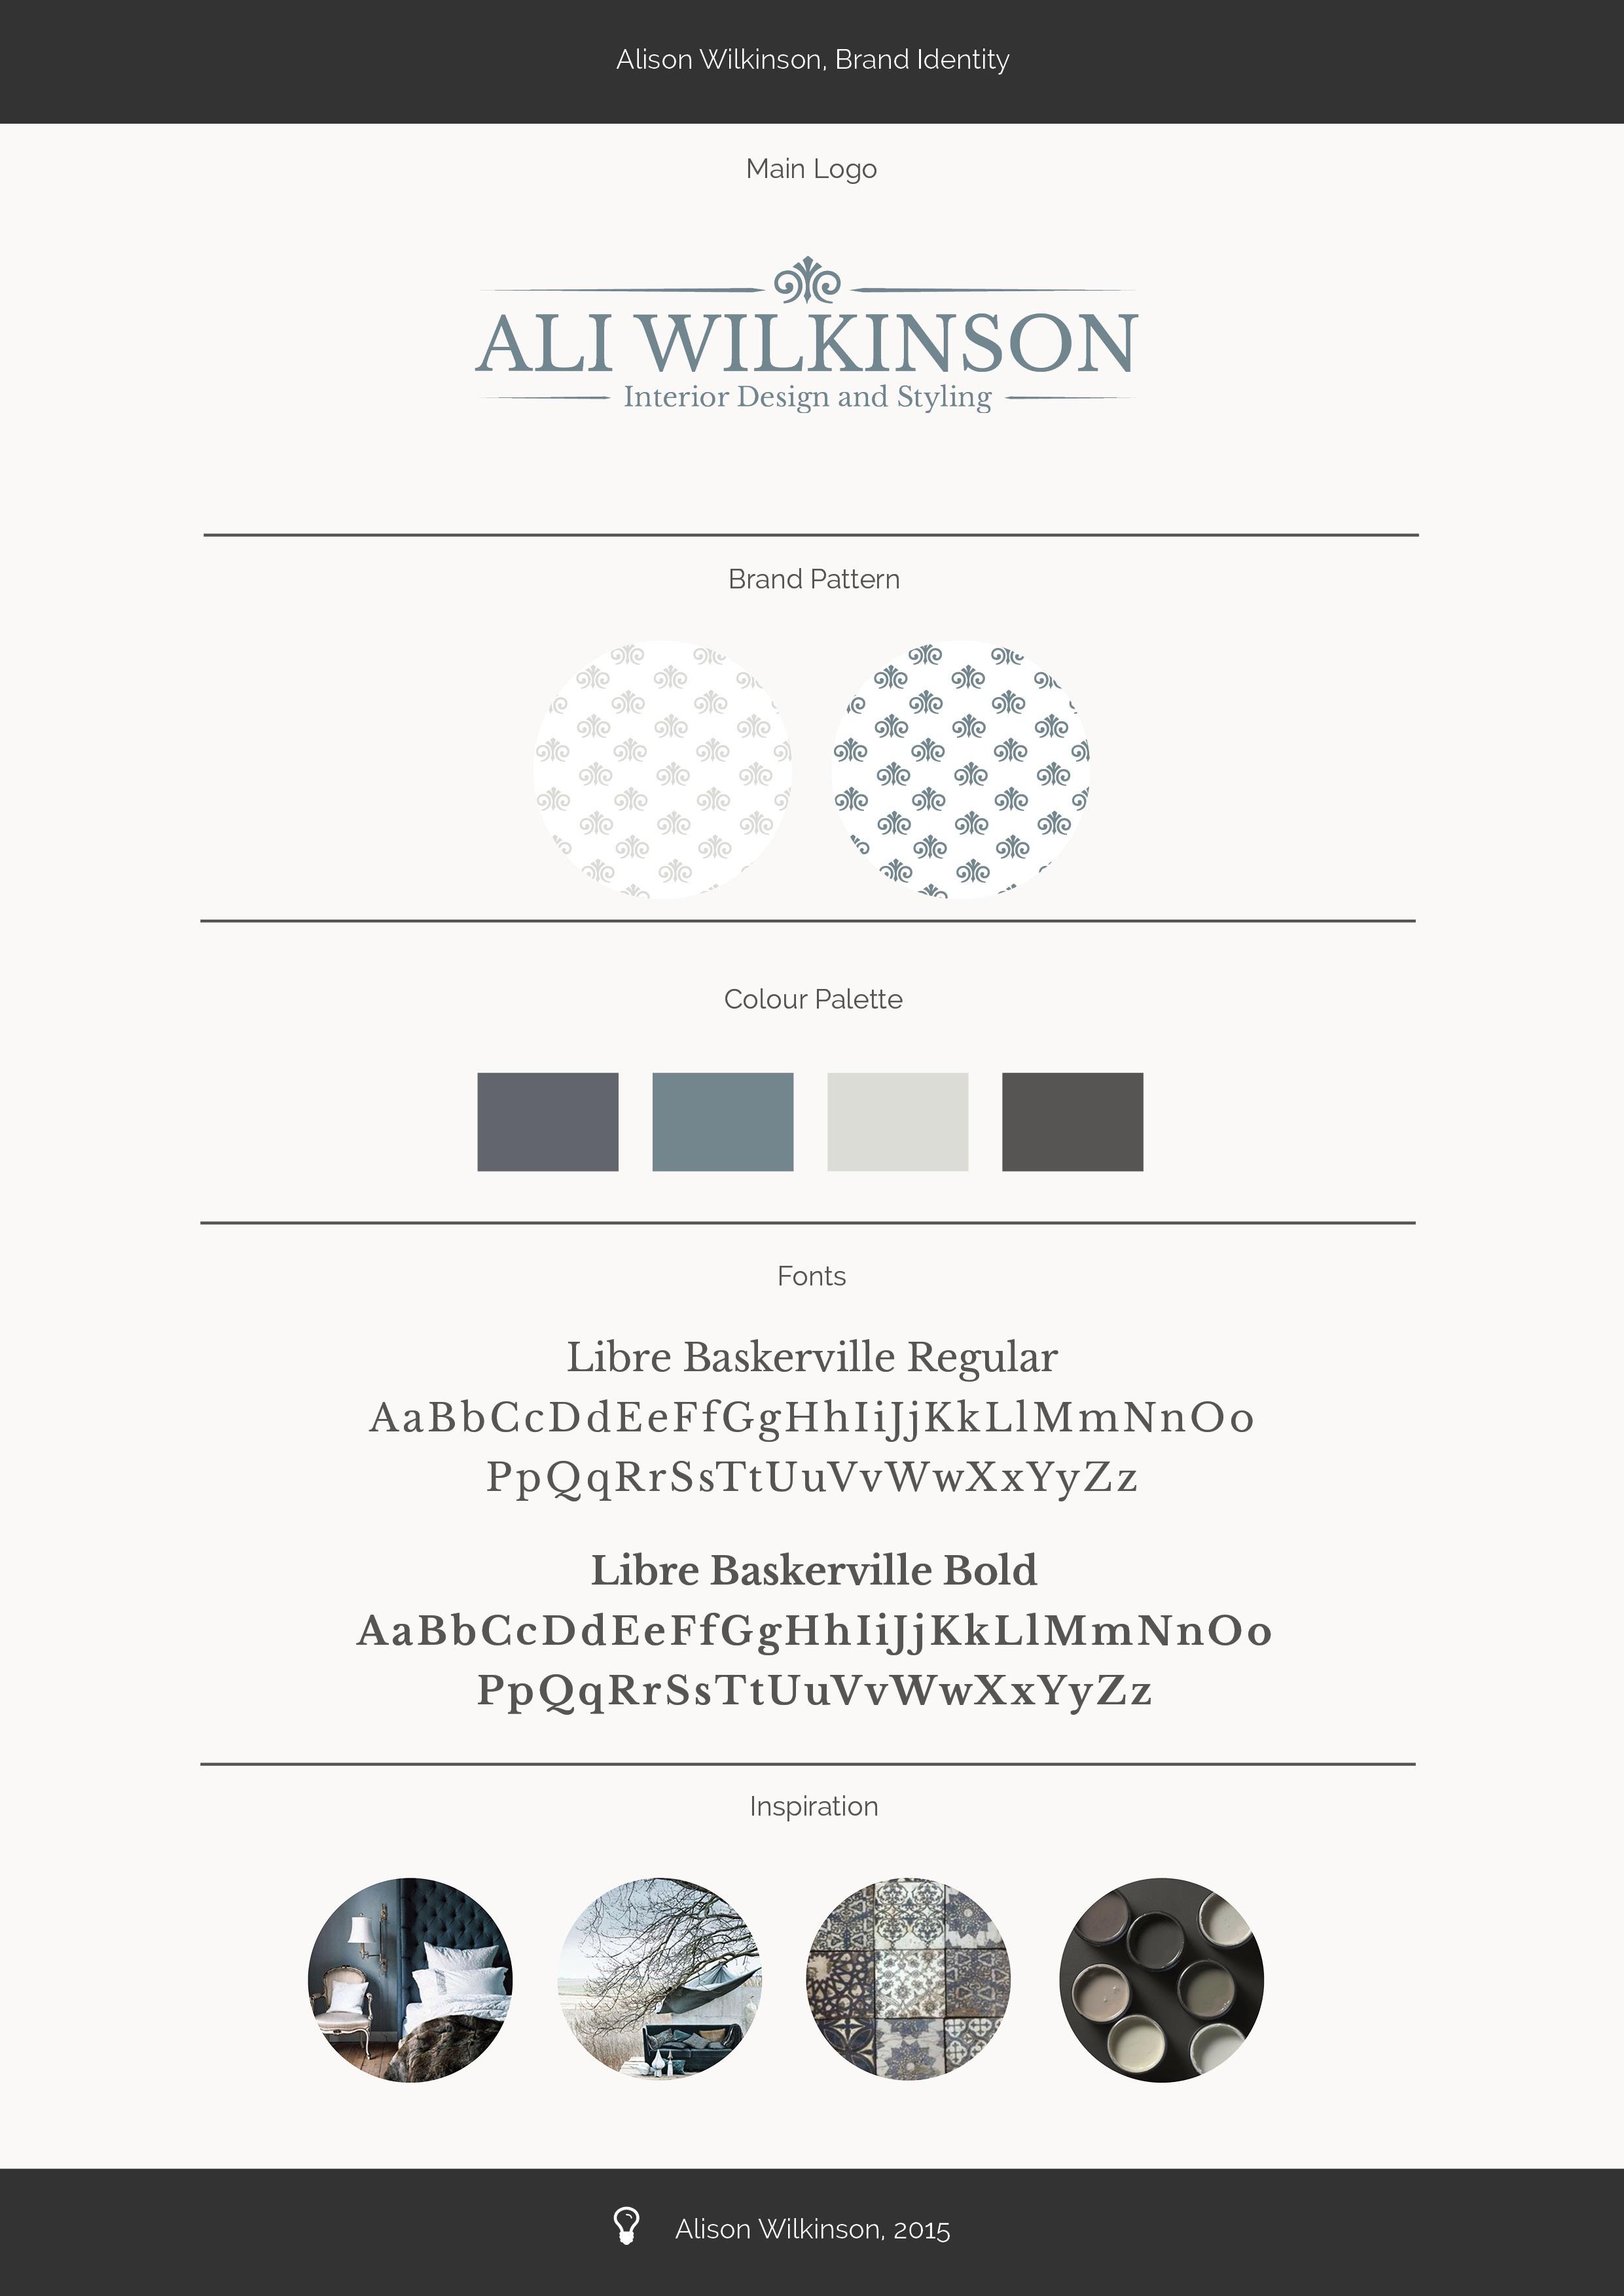 Alison Wilkinson Brand Identity